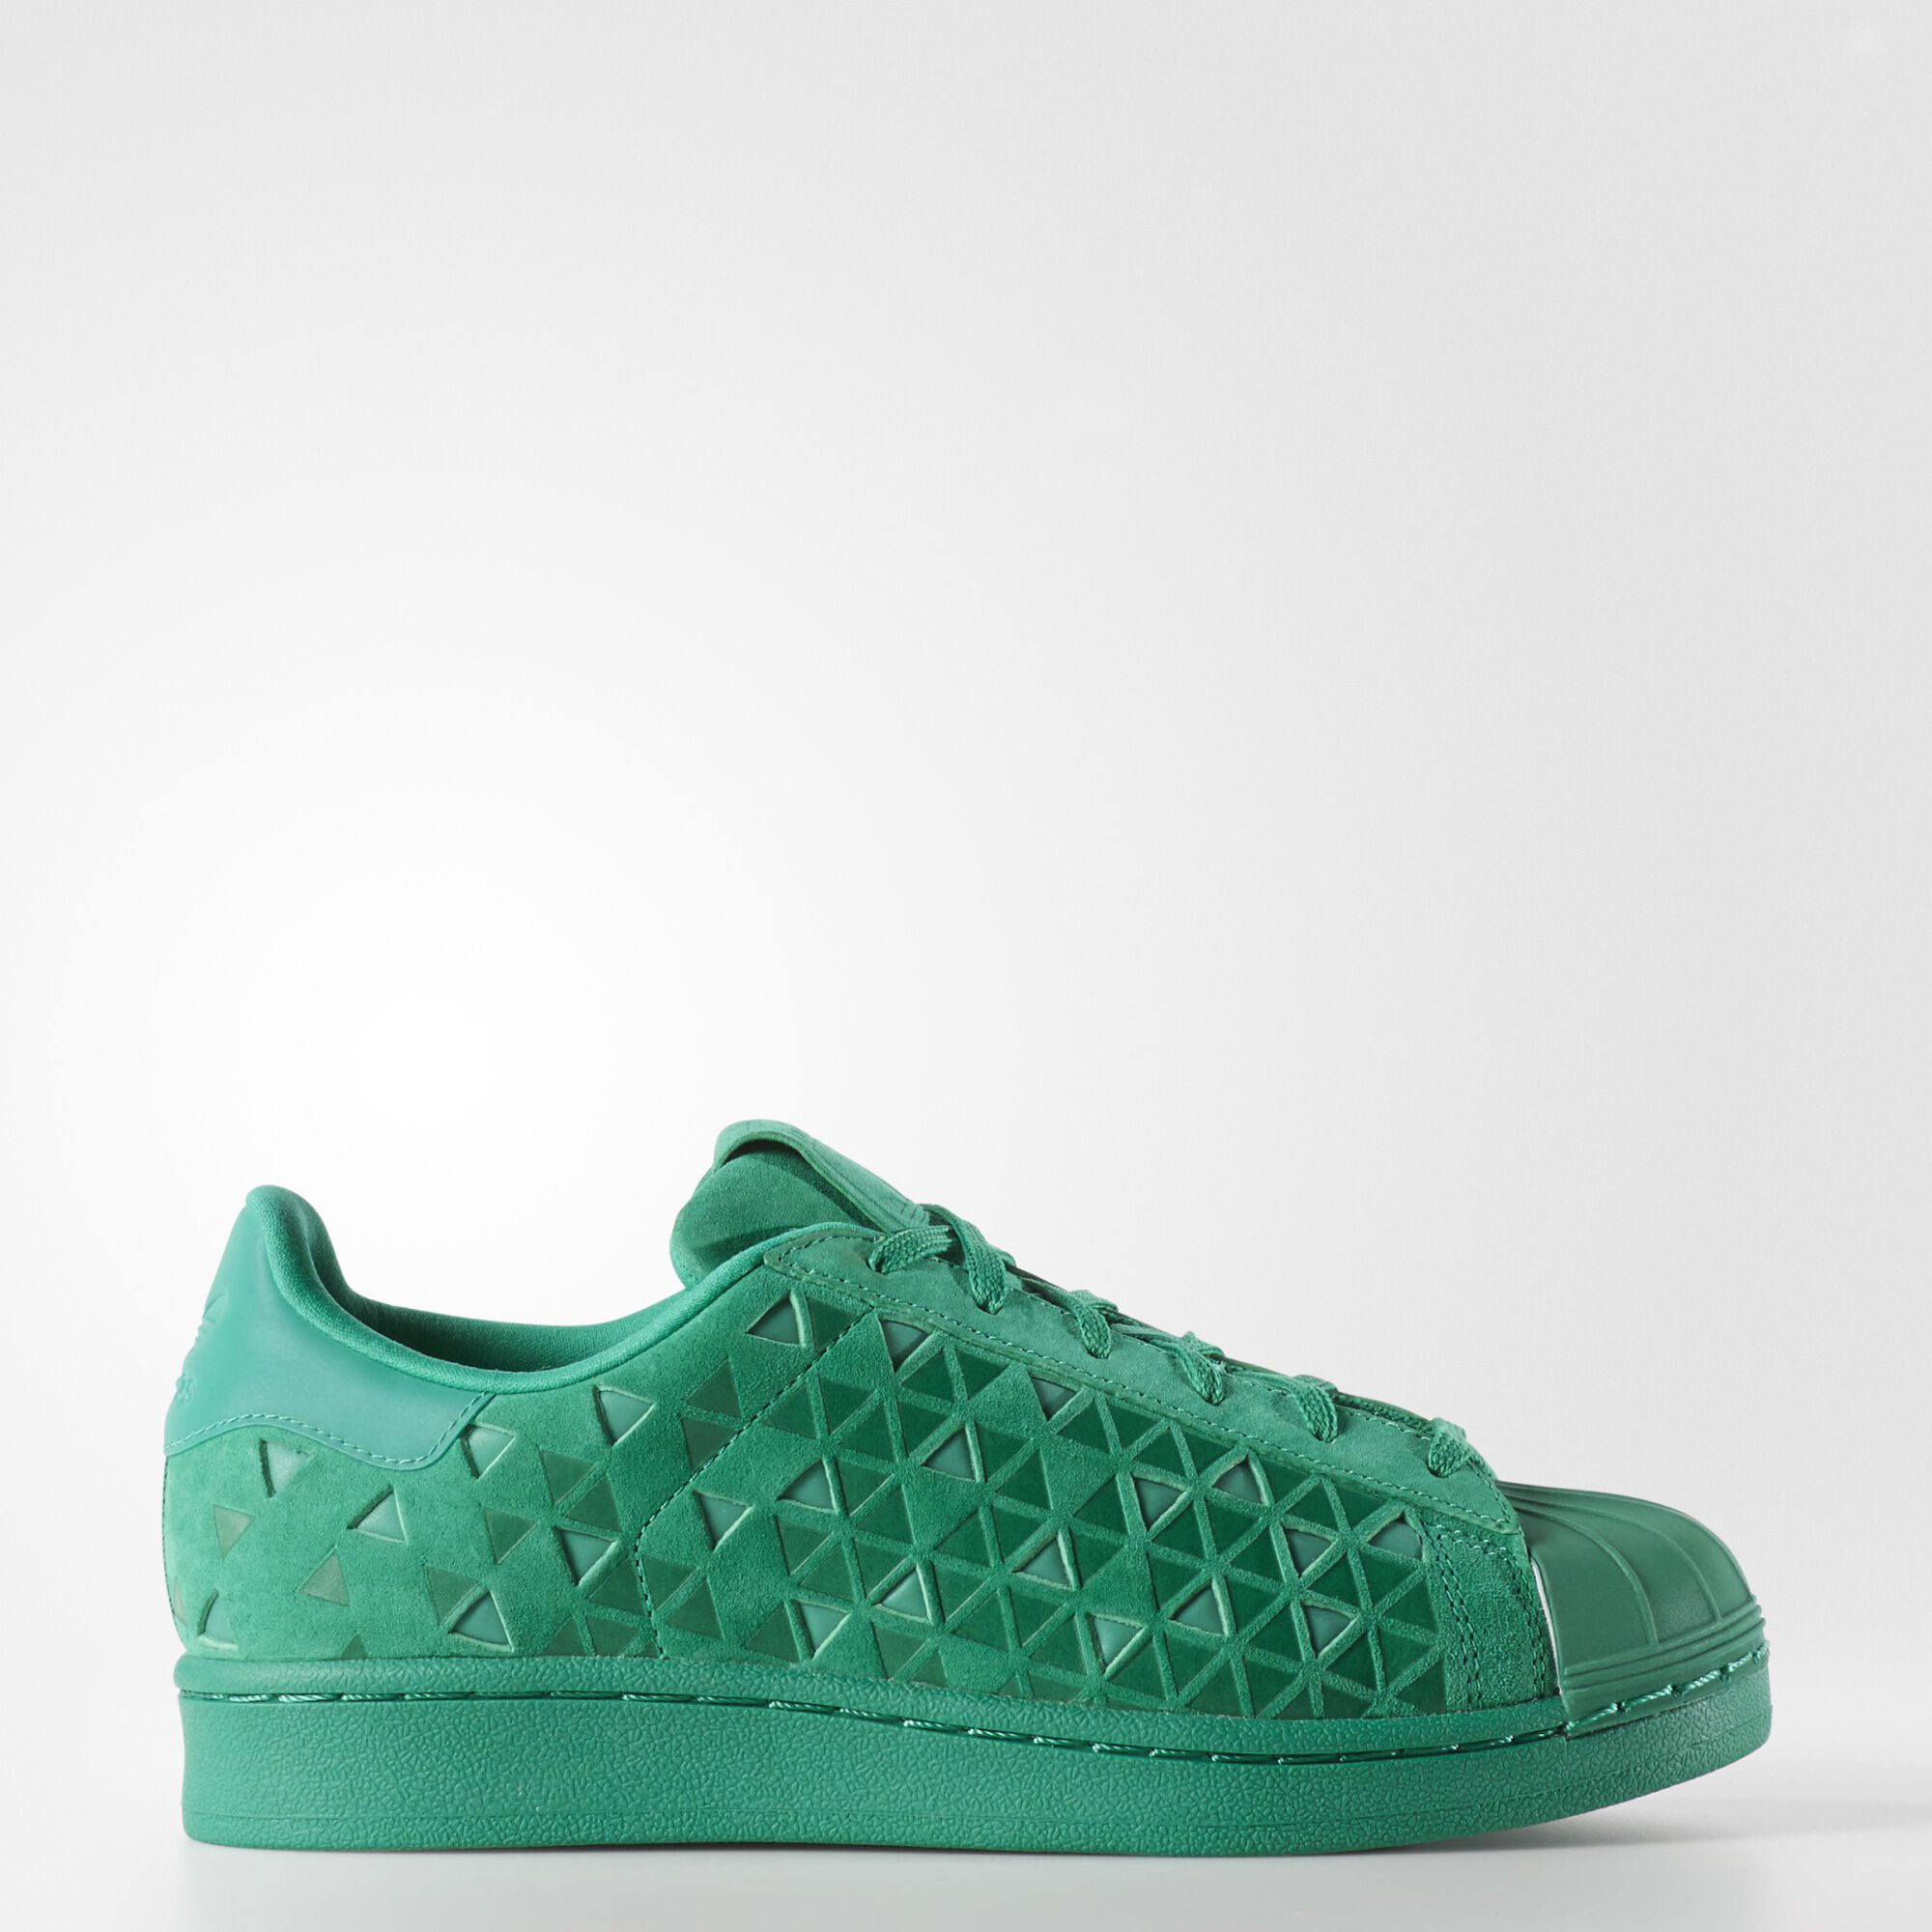 Adidas Superstar 2g Discontinued